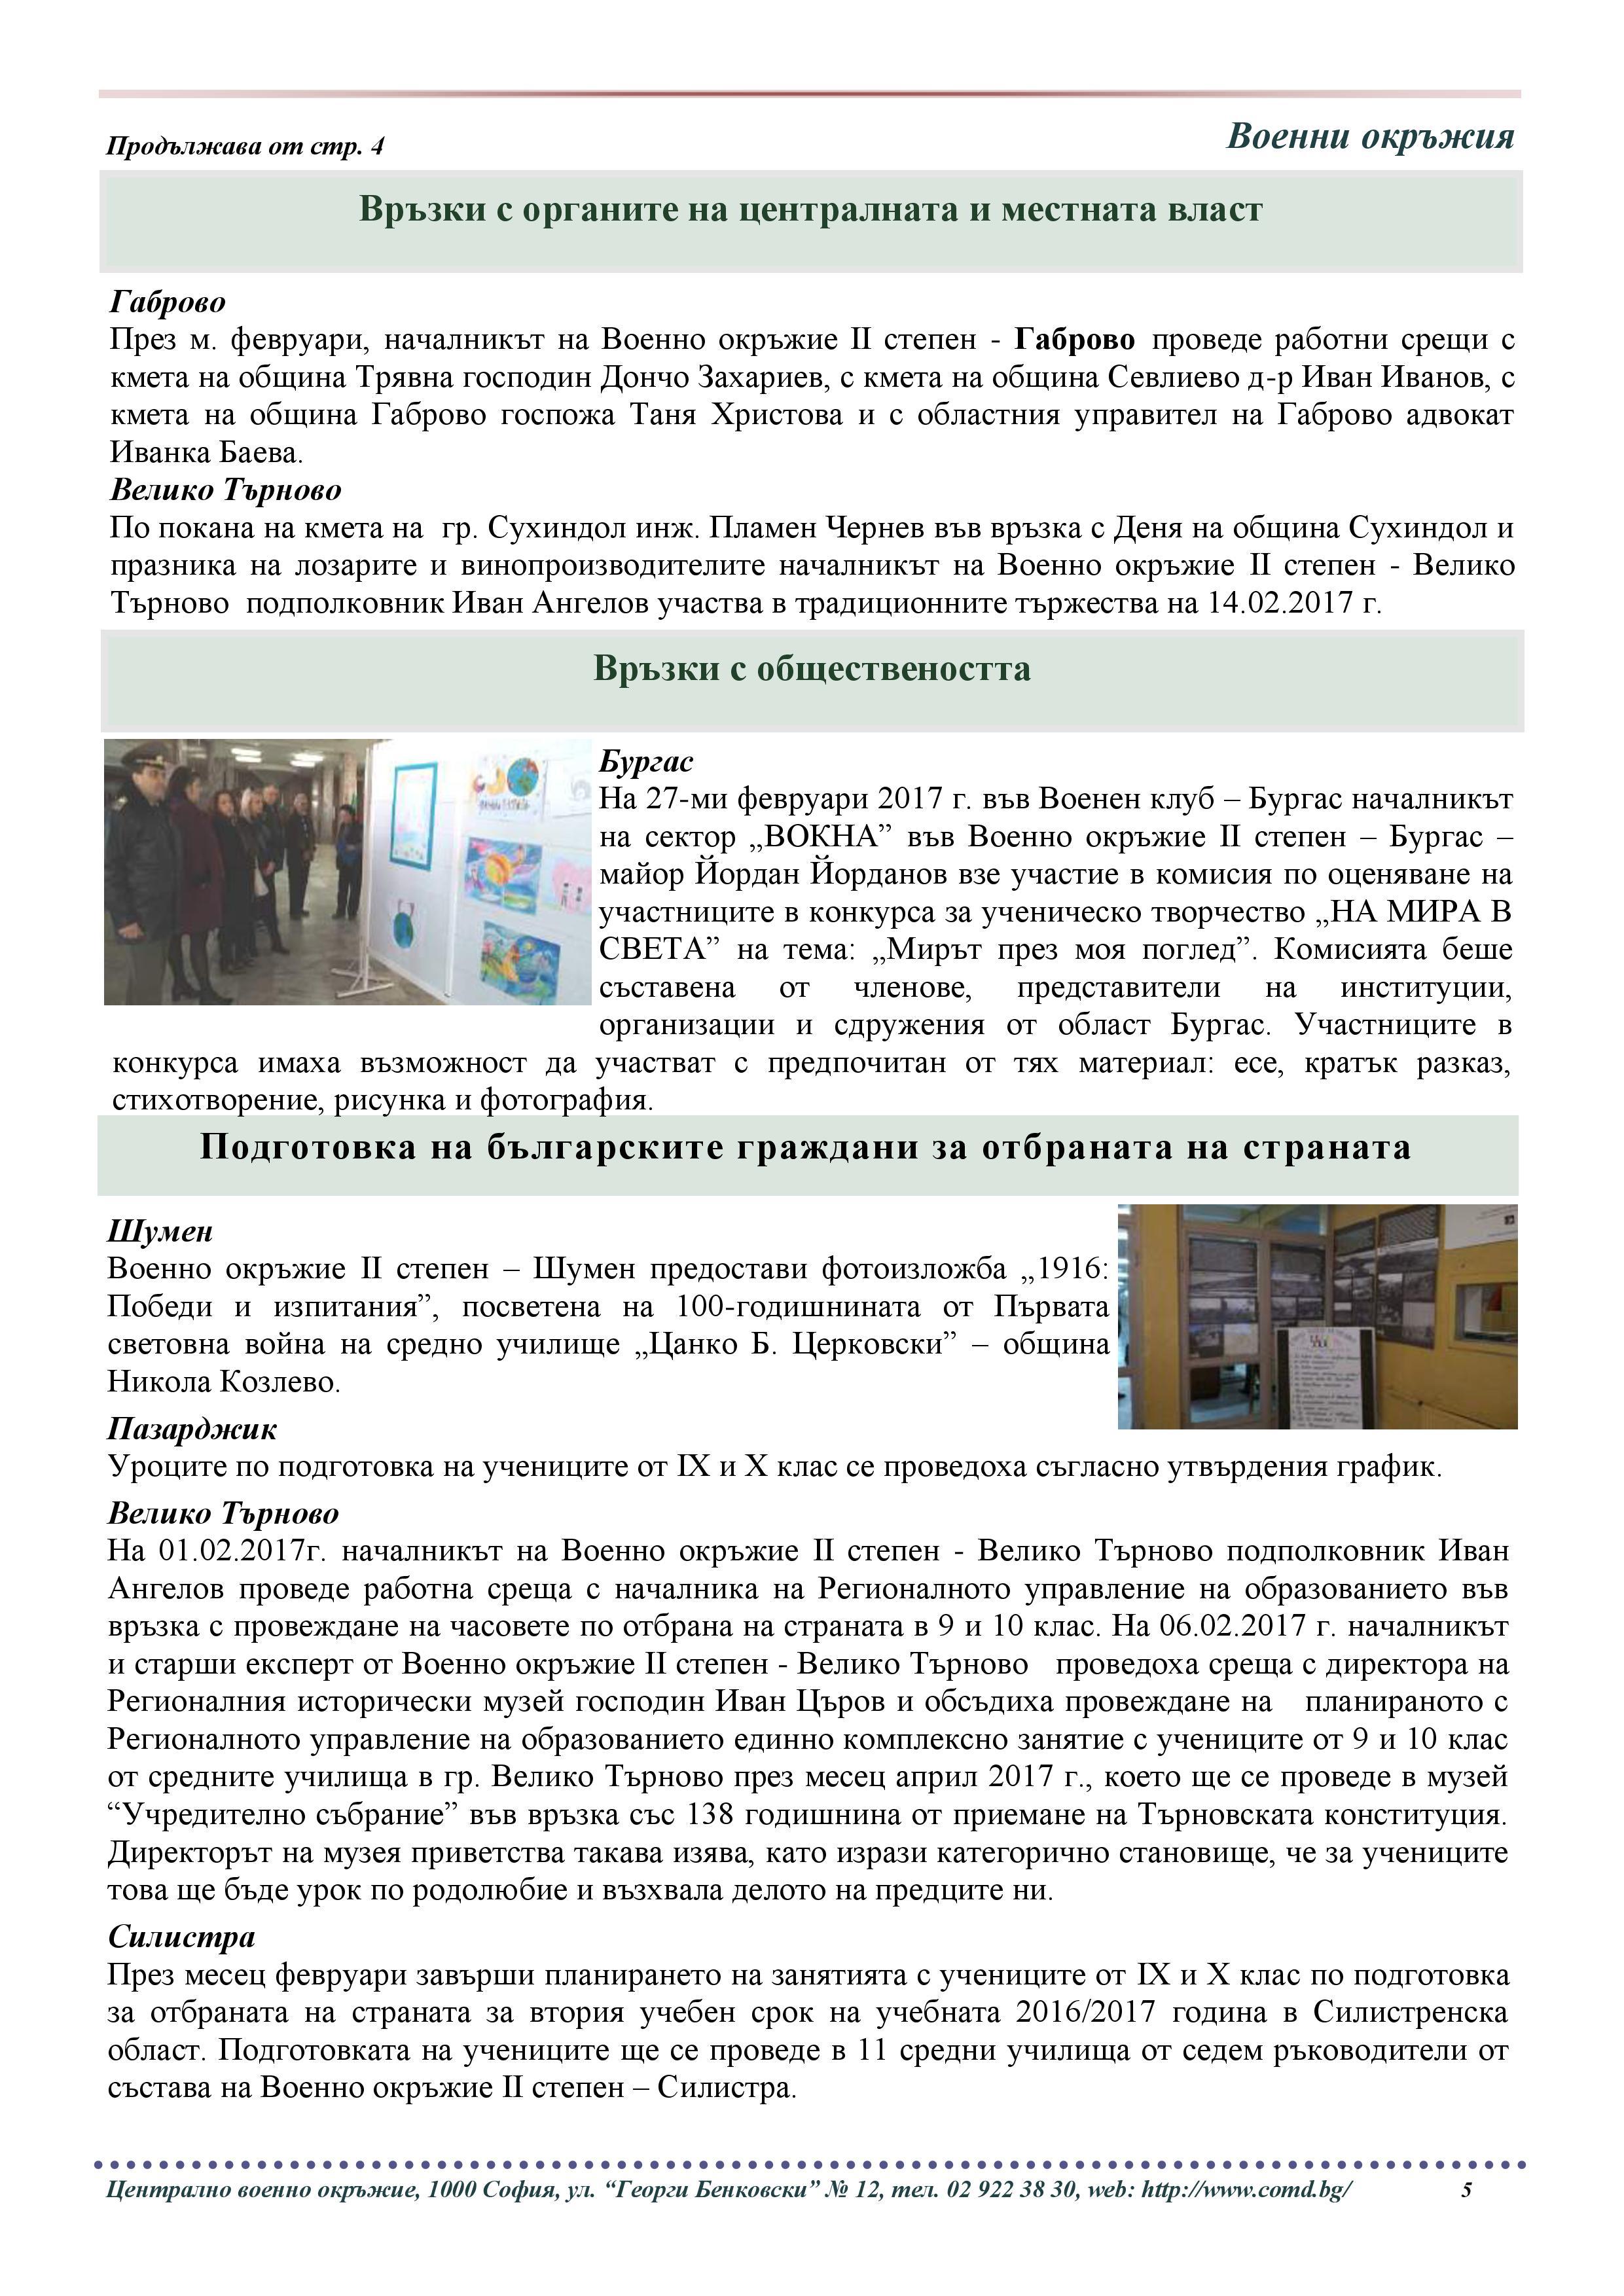 http://armymedia.bg/wp-content/uploads/2015/06/IB_2_2017g.compressed-za-izpra6tane-22.03.2017.page05.jpg